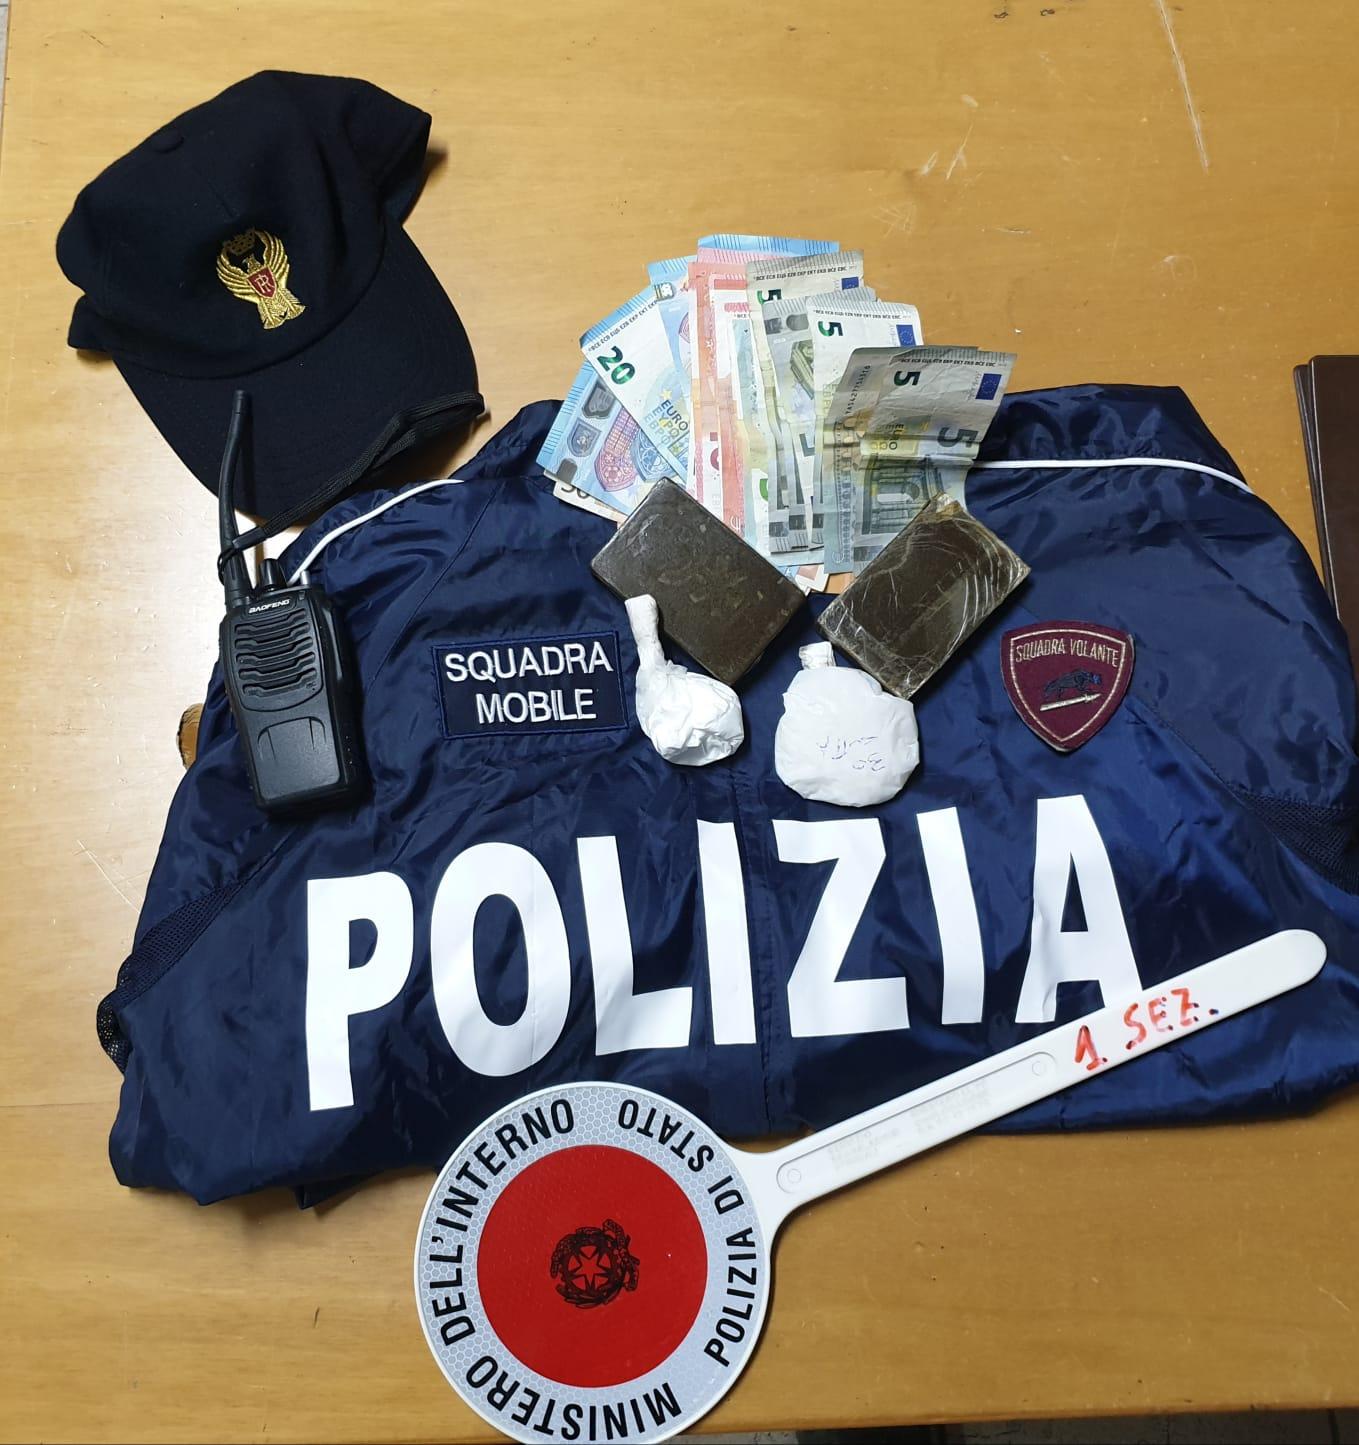 Donna arrestata a Siracusa, aveva hashish e cocaina e sostanza da taglio